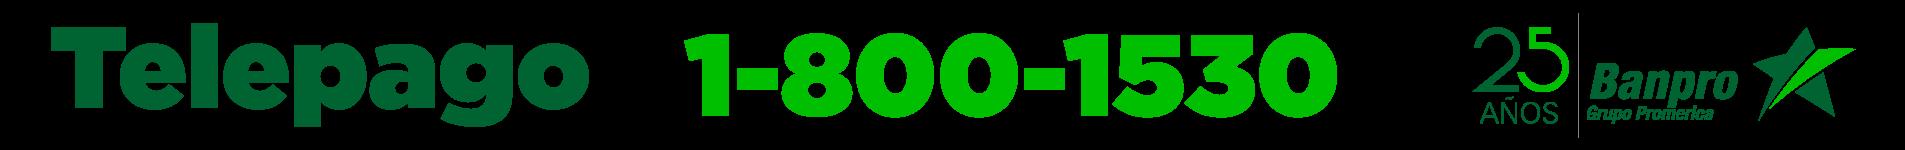 Telepago BANPRO